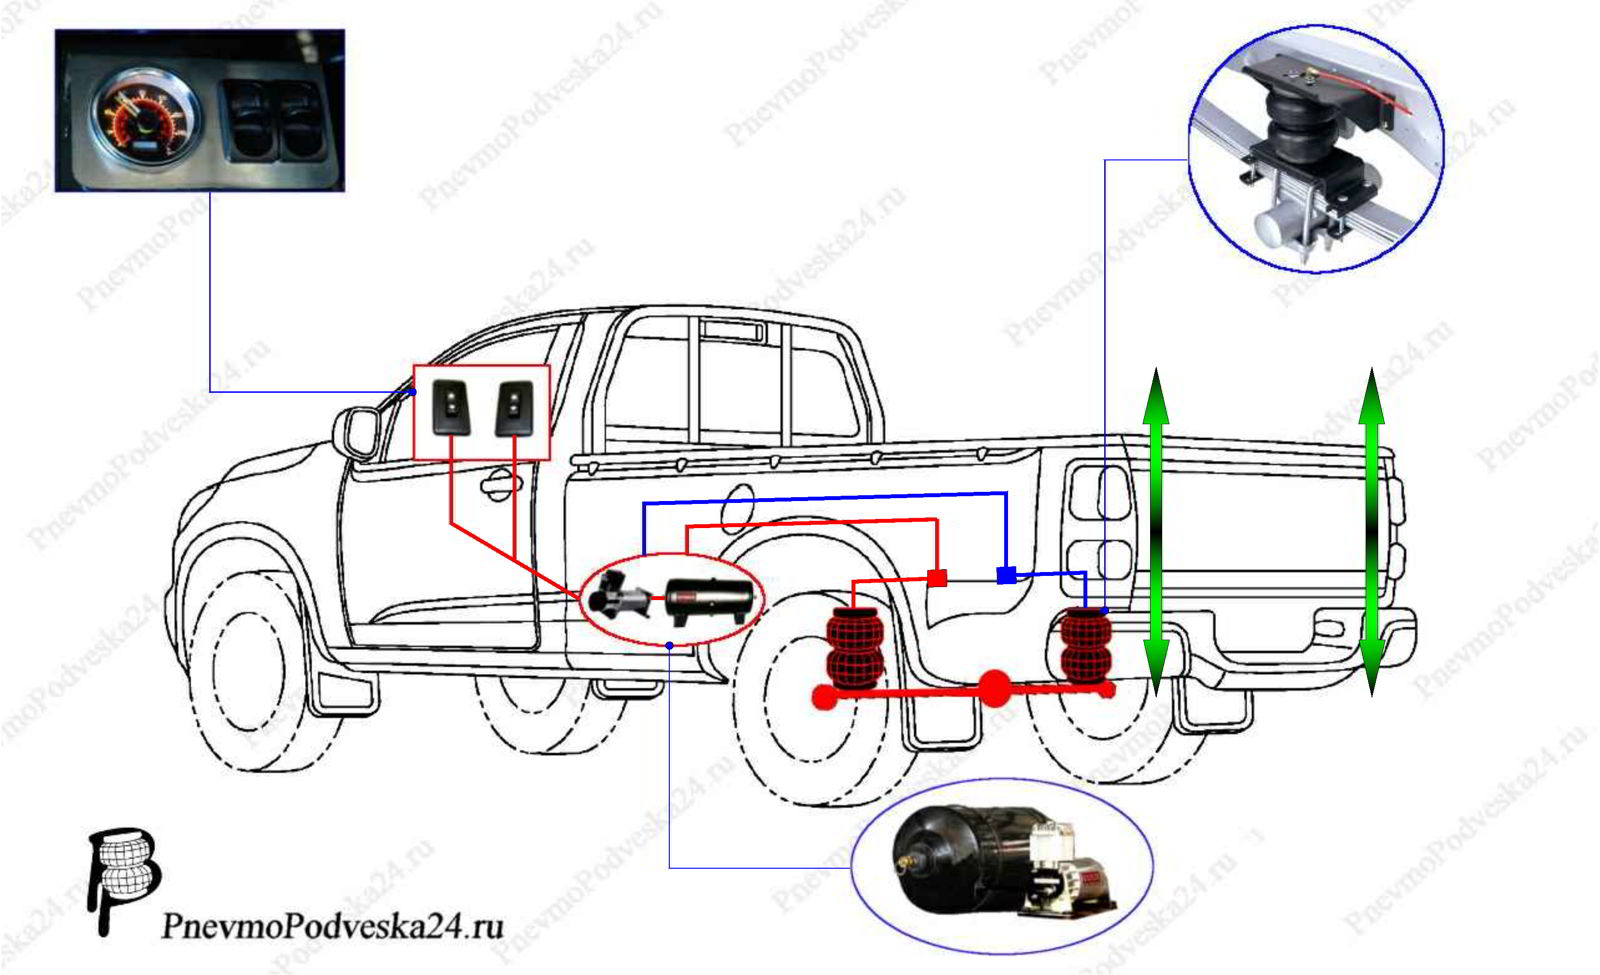 Система управление пневмо подвеской на Л200